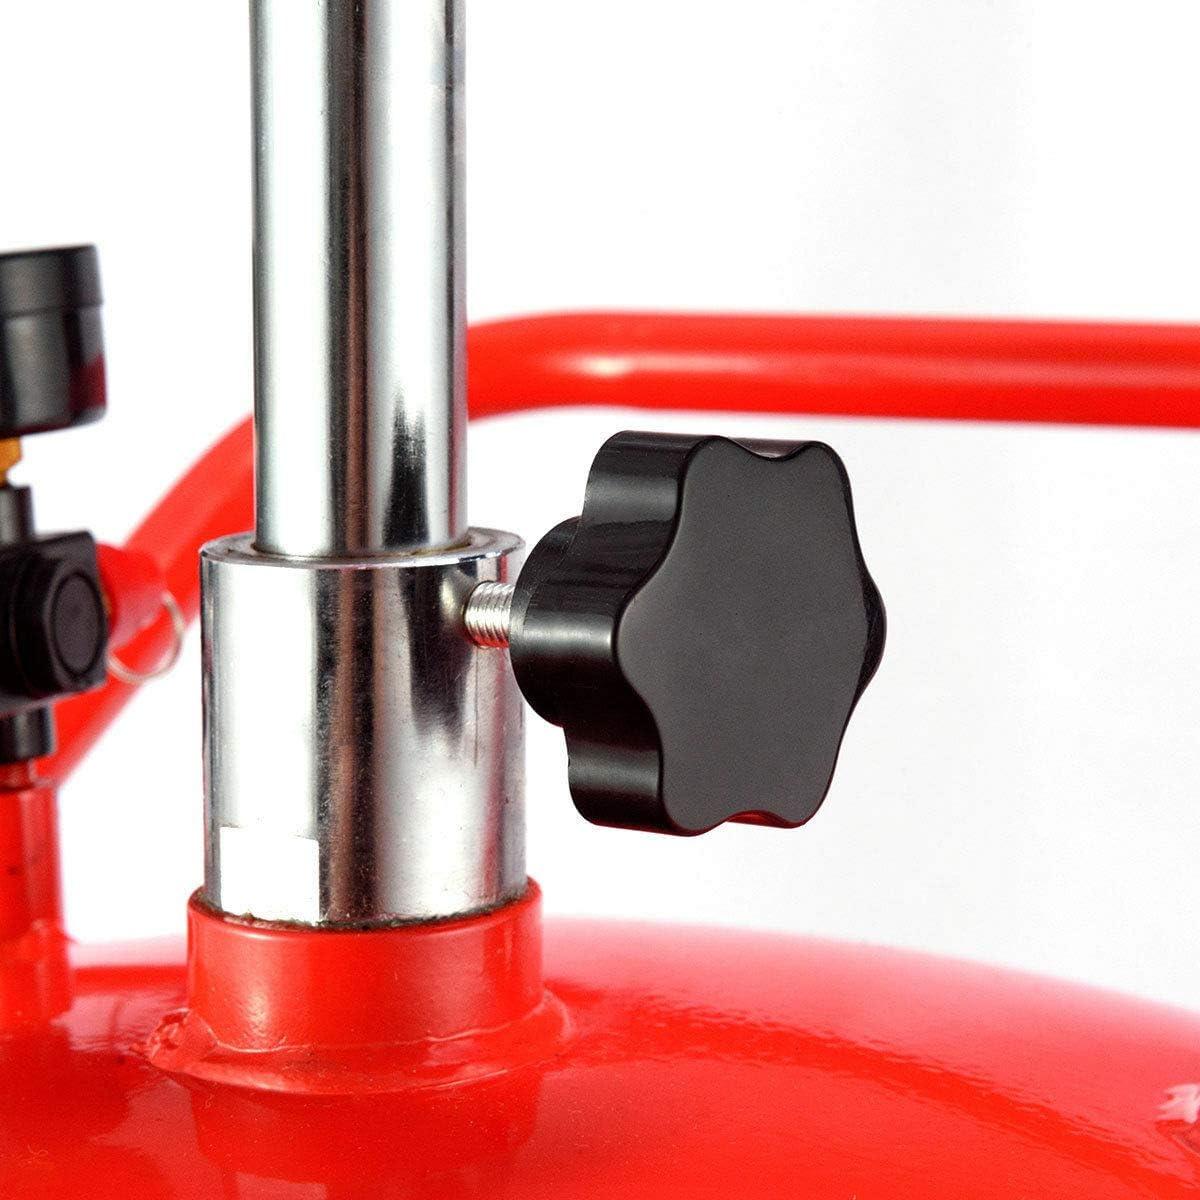 Fuel Transfer /& Lubrication Automotive Hose Operated Adjustable Drainage Lift Tools Equipment Garage /& Shop Fuel Transfer /& Lubrication Waste Oil Drain Tank 20 Gallon Portable Capacity Operate Wheel